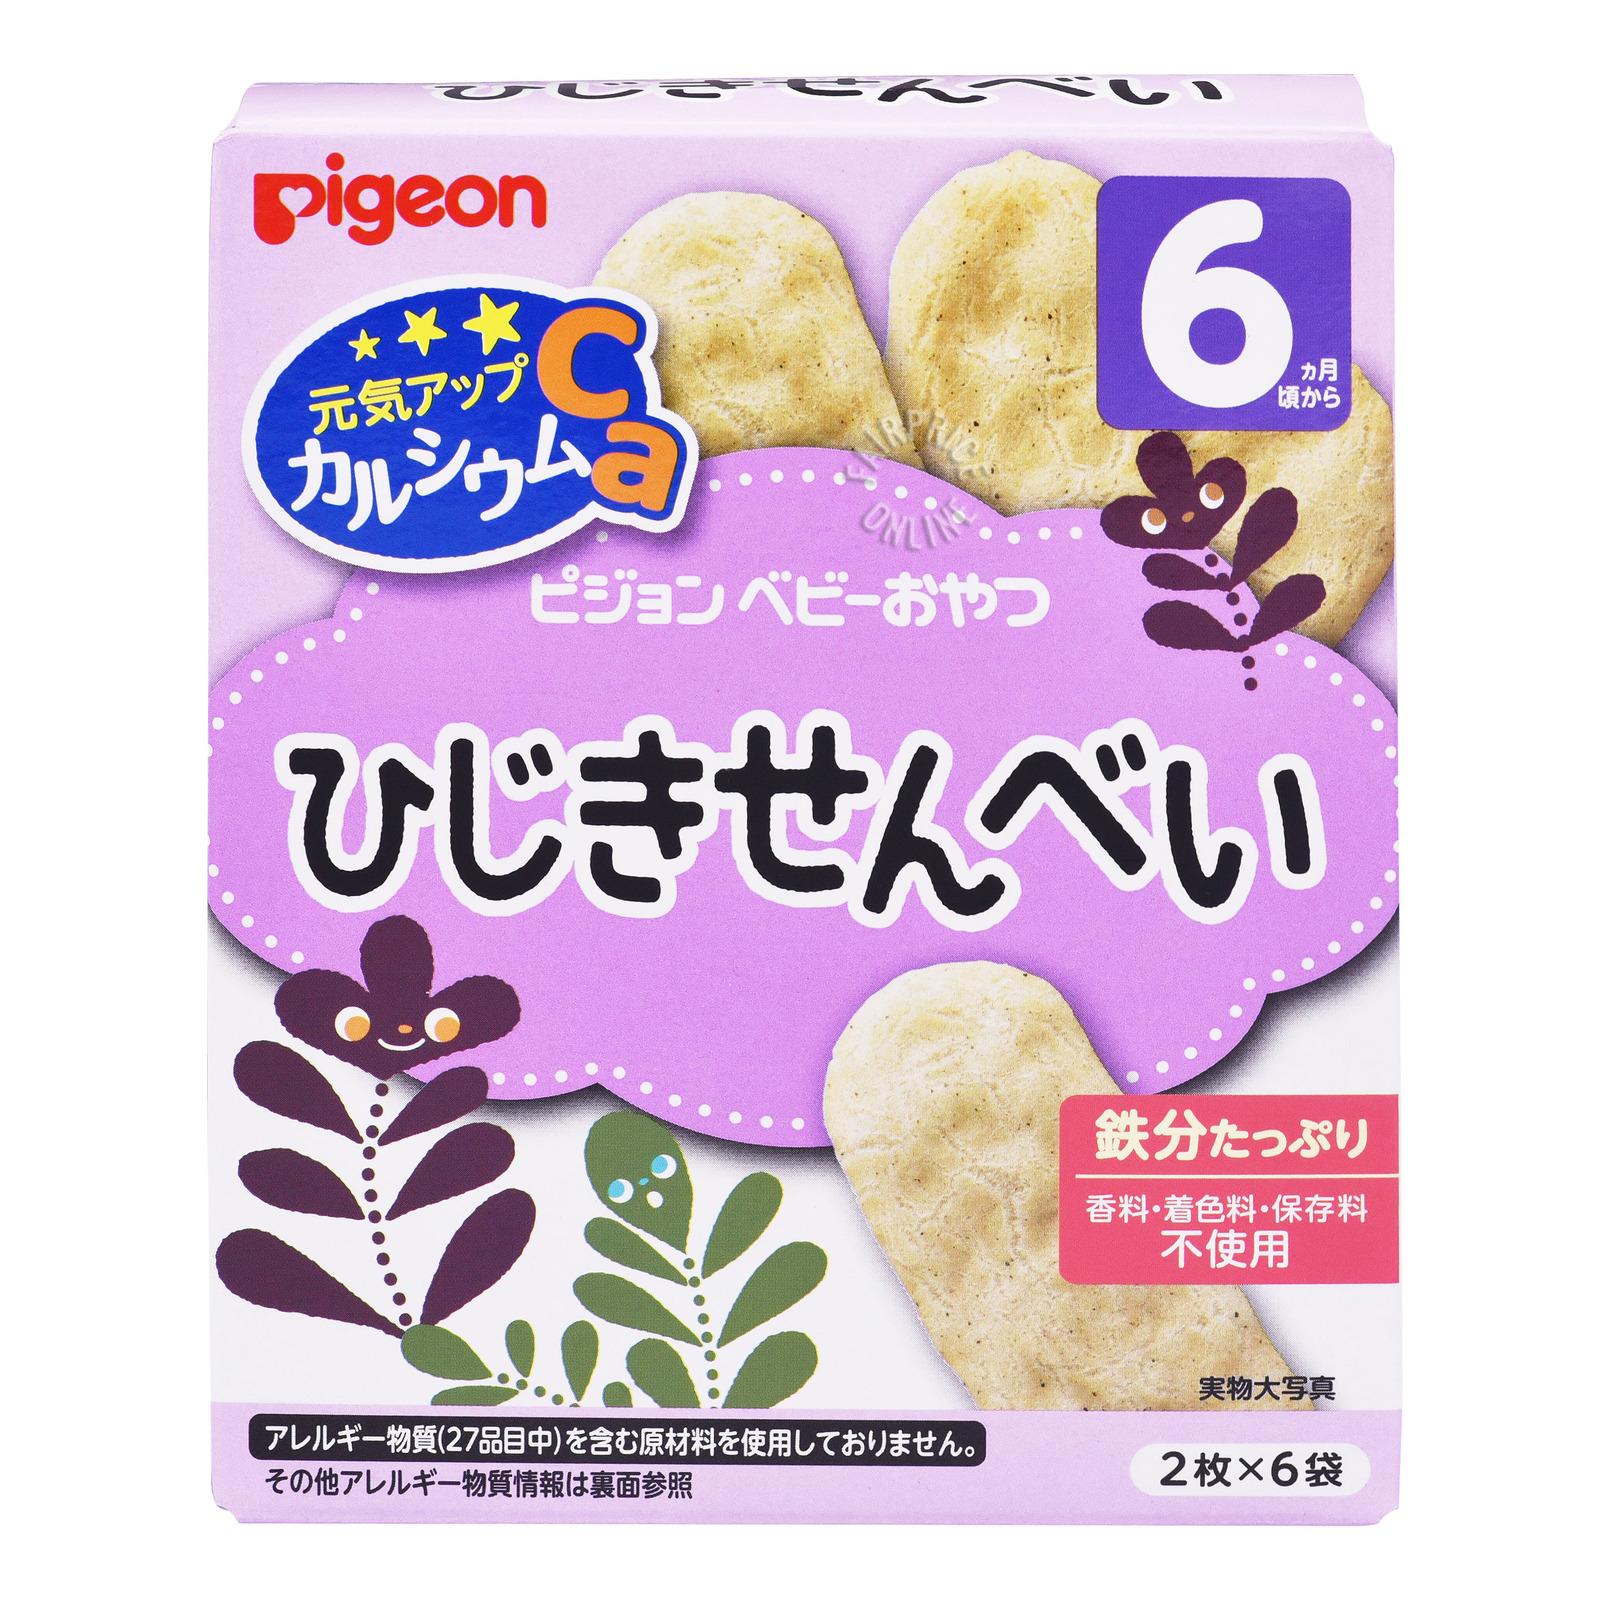 Pigeon Baby Rice Crackers - Brown Alga